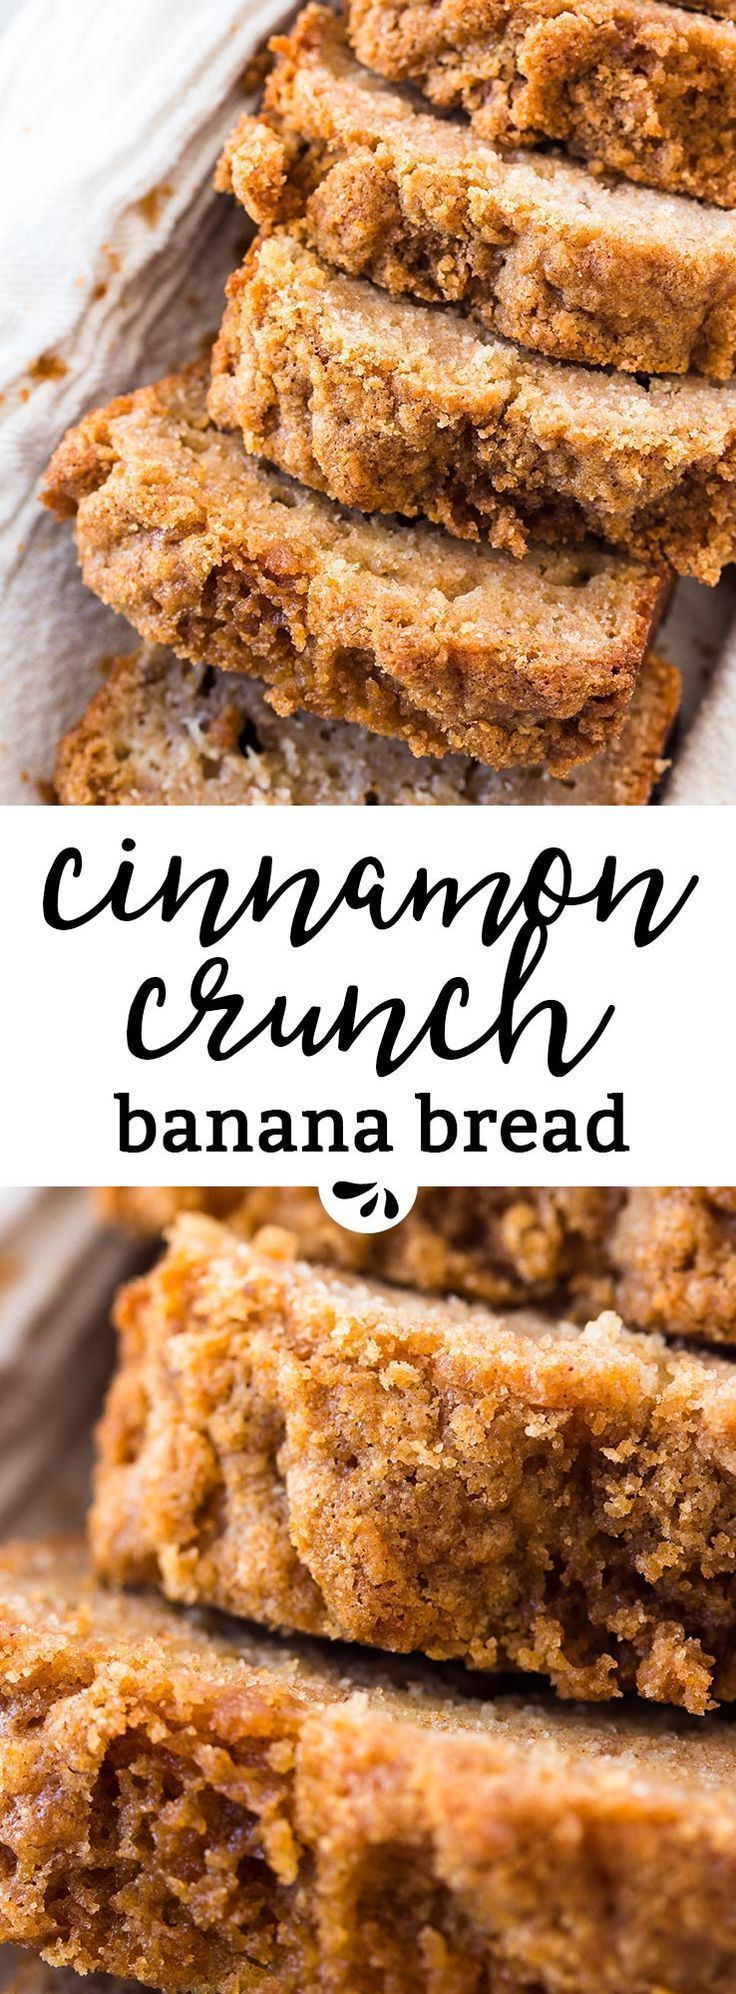 Whole Wheat Cinnamon Crunch Banana Bread Recipe | Savory Nothings